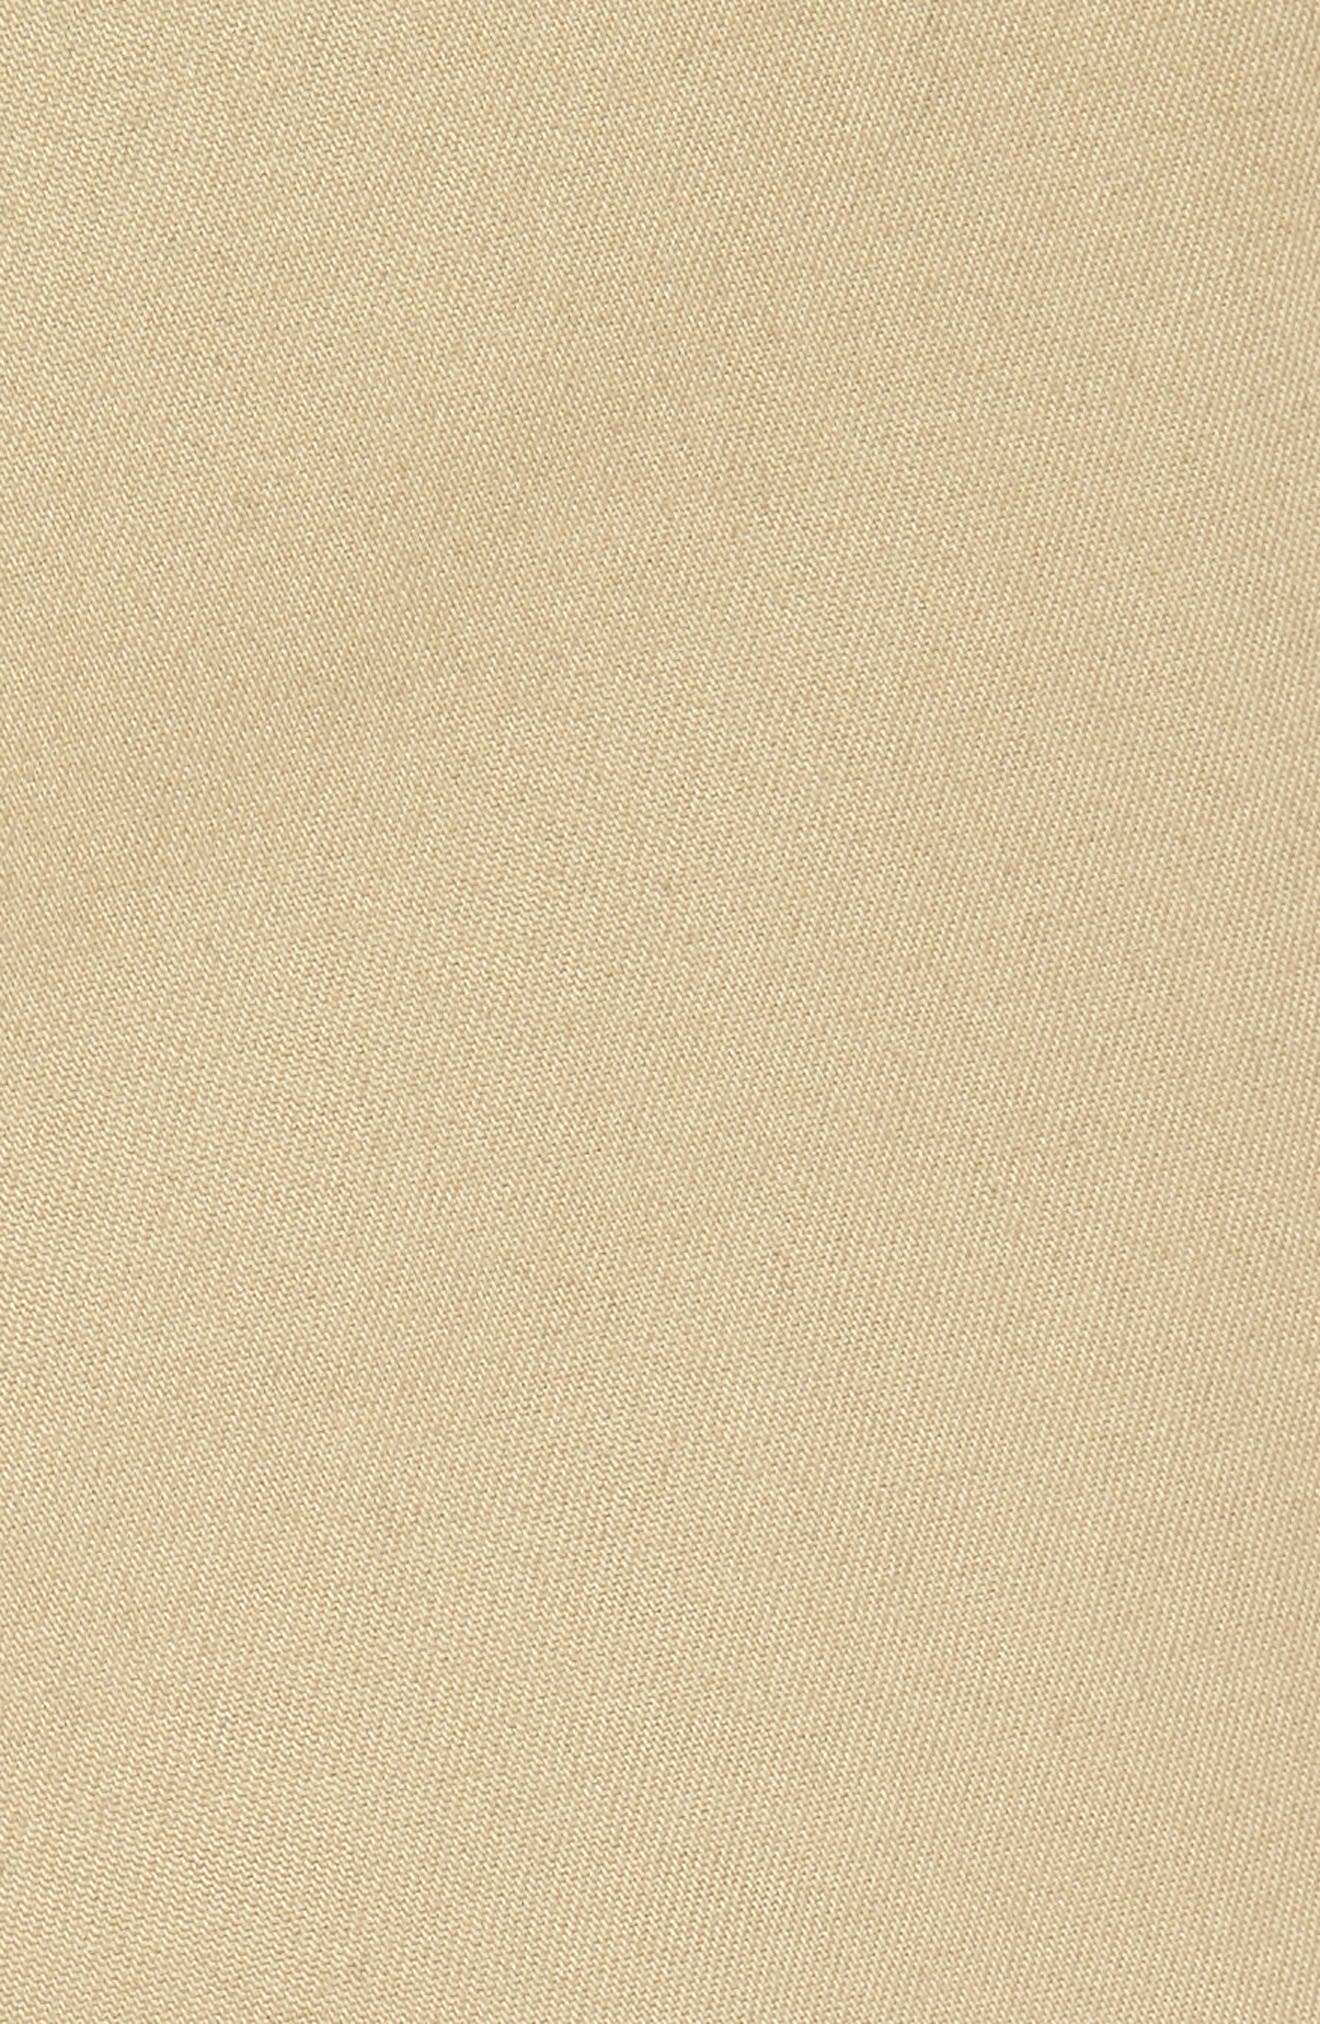 Slim Fit Chino Shorts,                             Alternate thumbnail 5, color,                             250